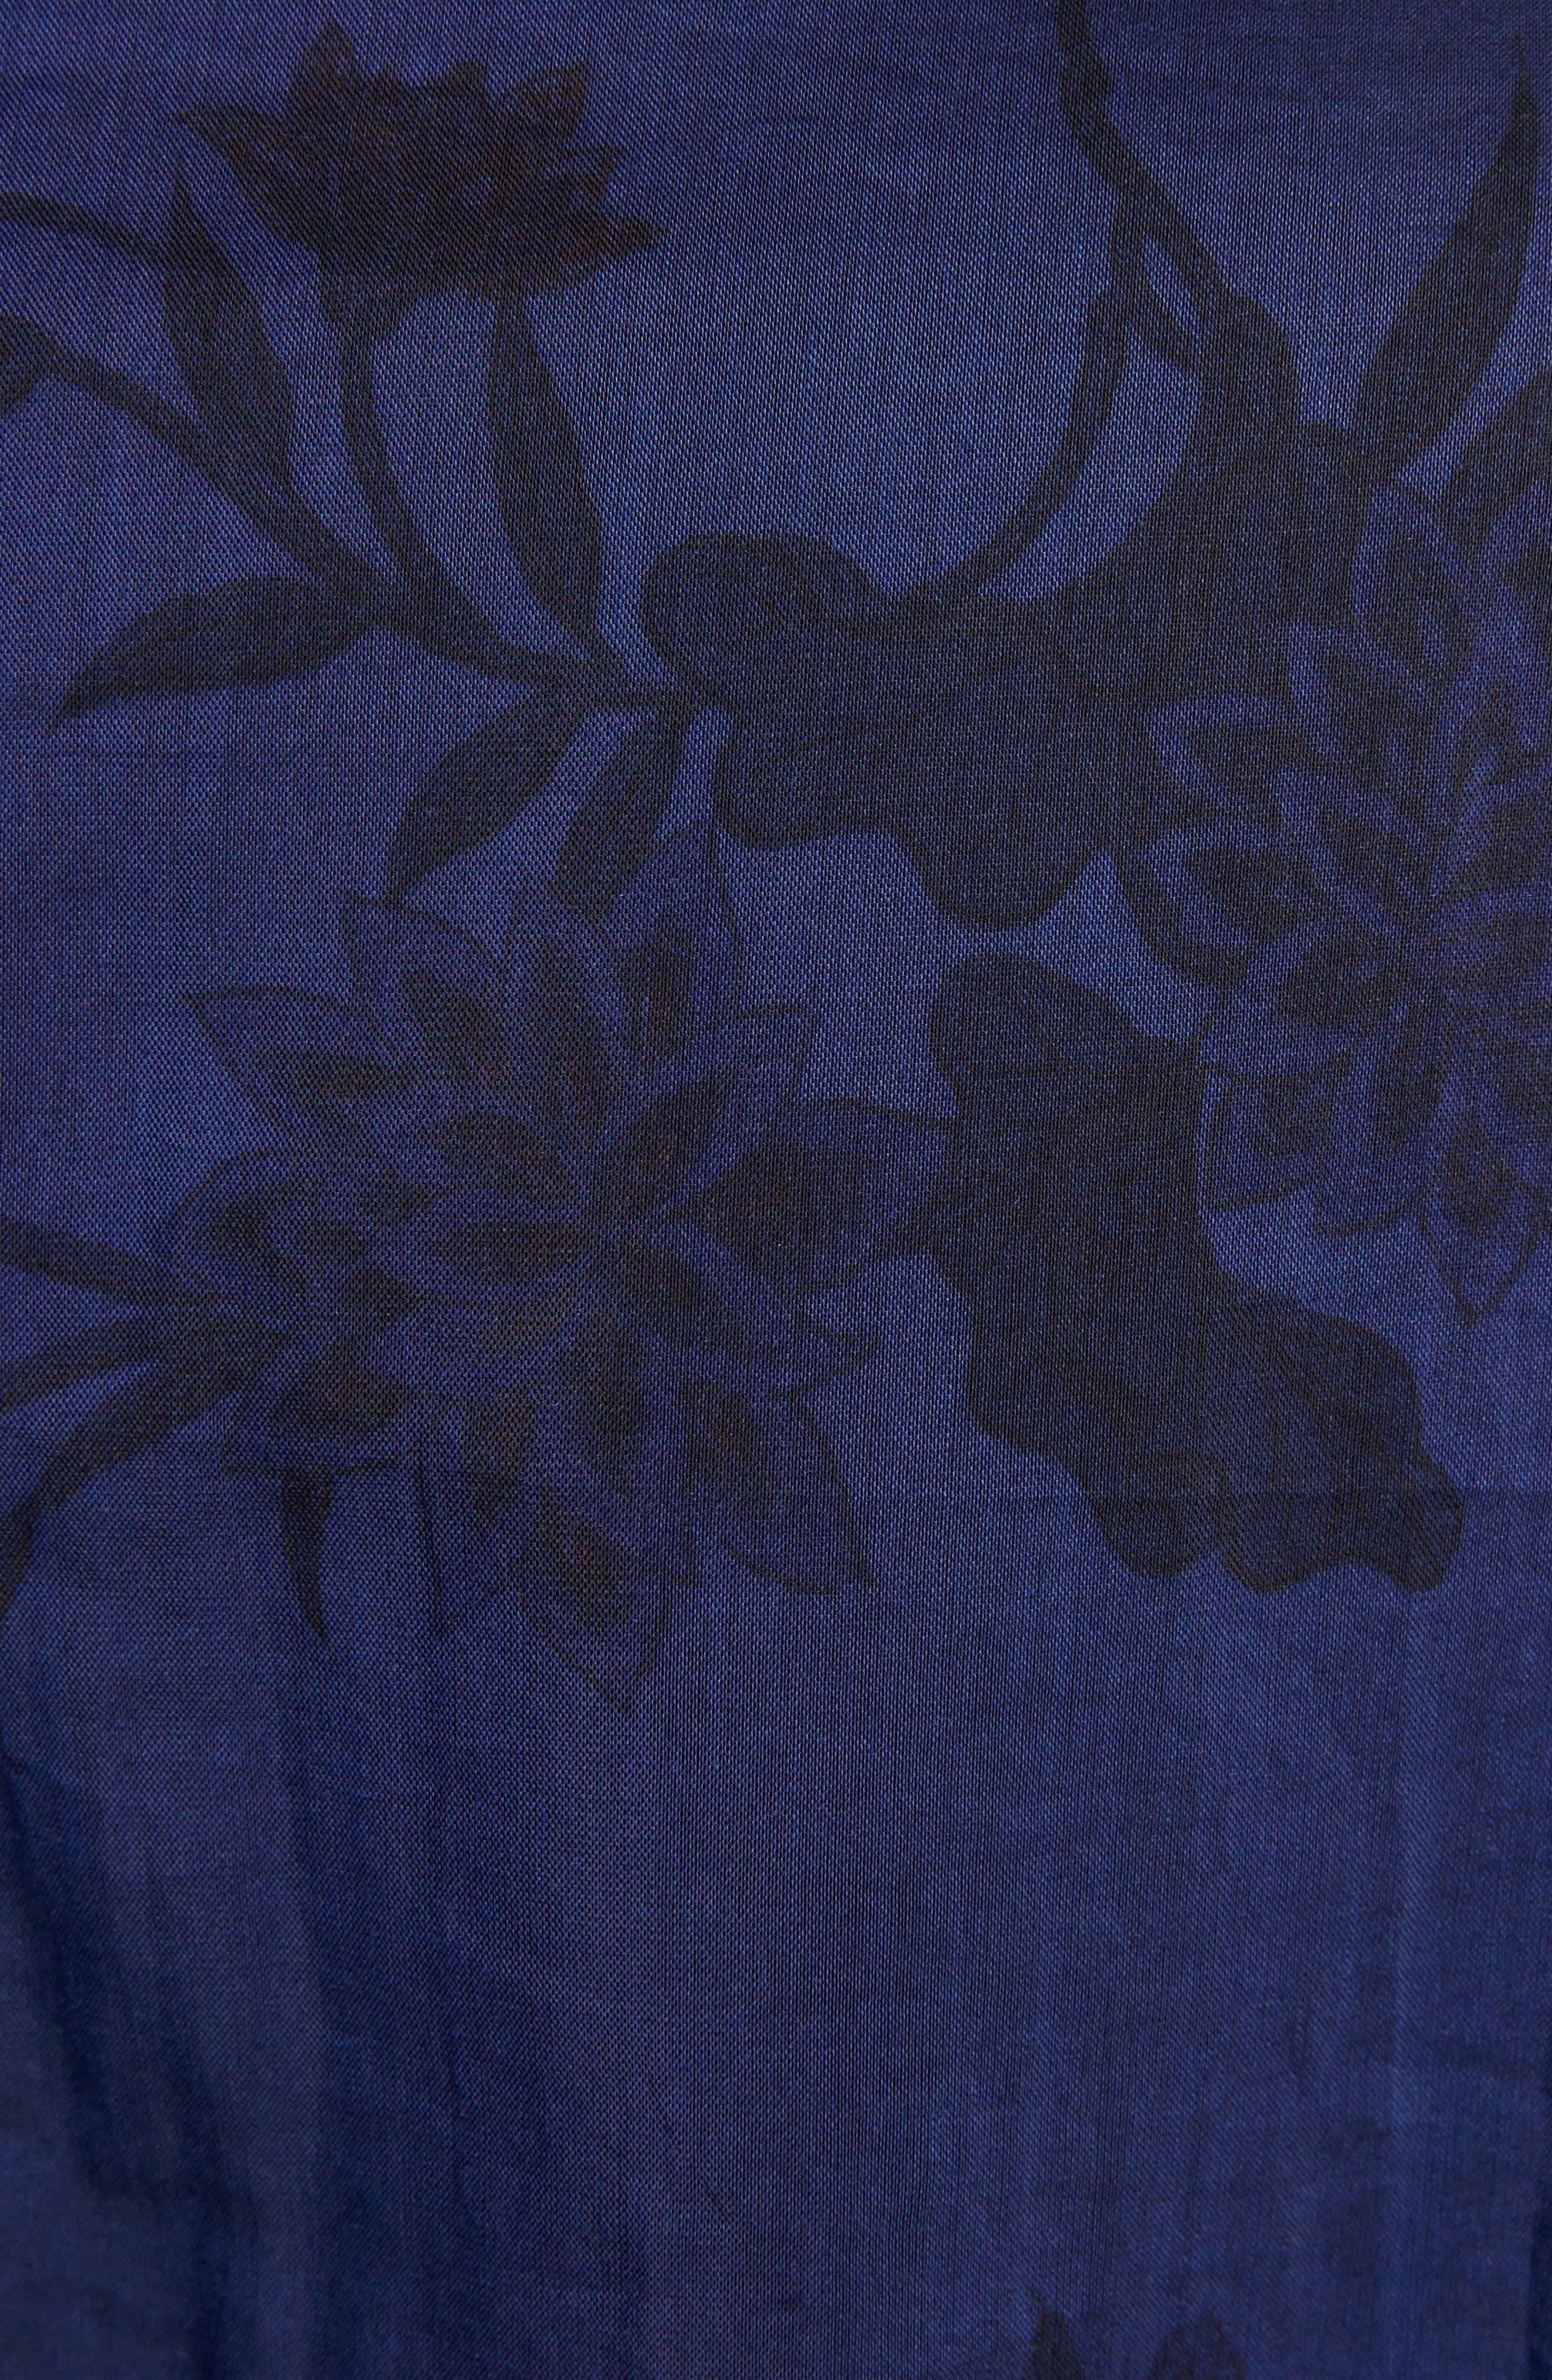 Floral Print Shirt,                             Alternate thumbnail 5, color,                             400